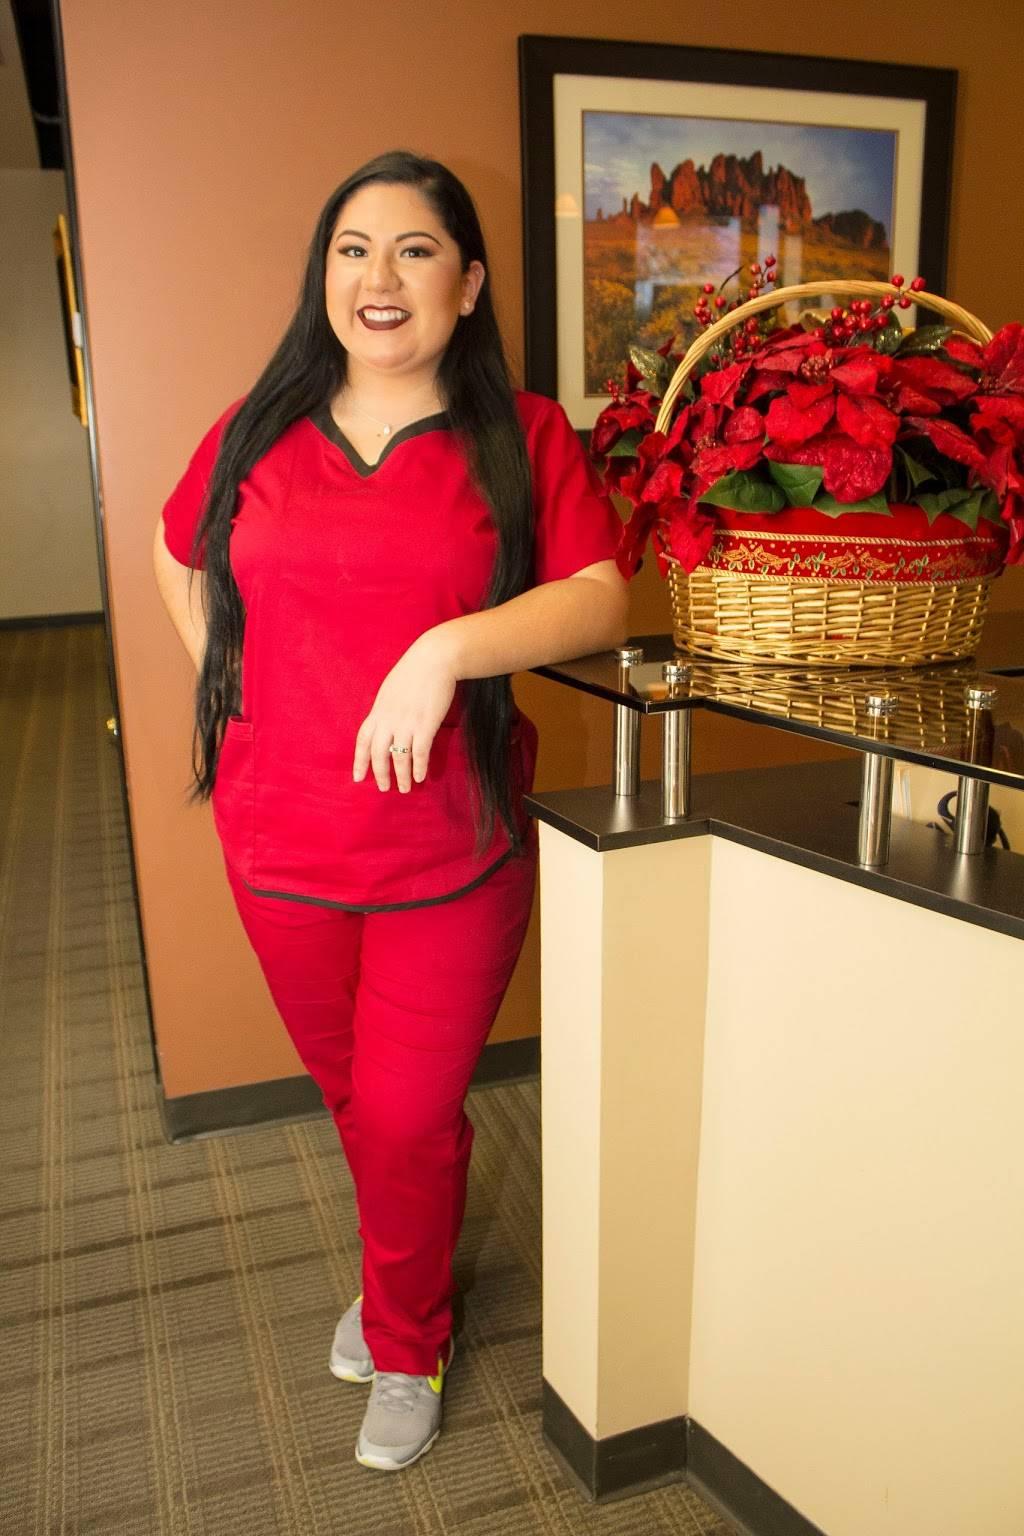 Arizona Orthodontic Centers - dentist    Photo 7 of 10   Address: 4130 N 108th Ave # 103, Phoenix, AZ 85037, USA   Phone: (623) 877-8500